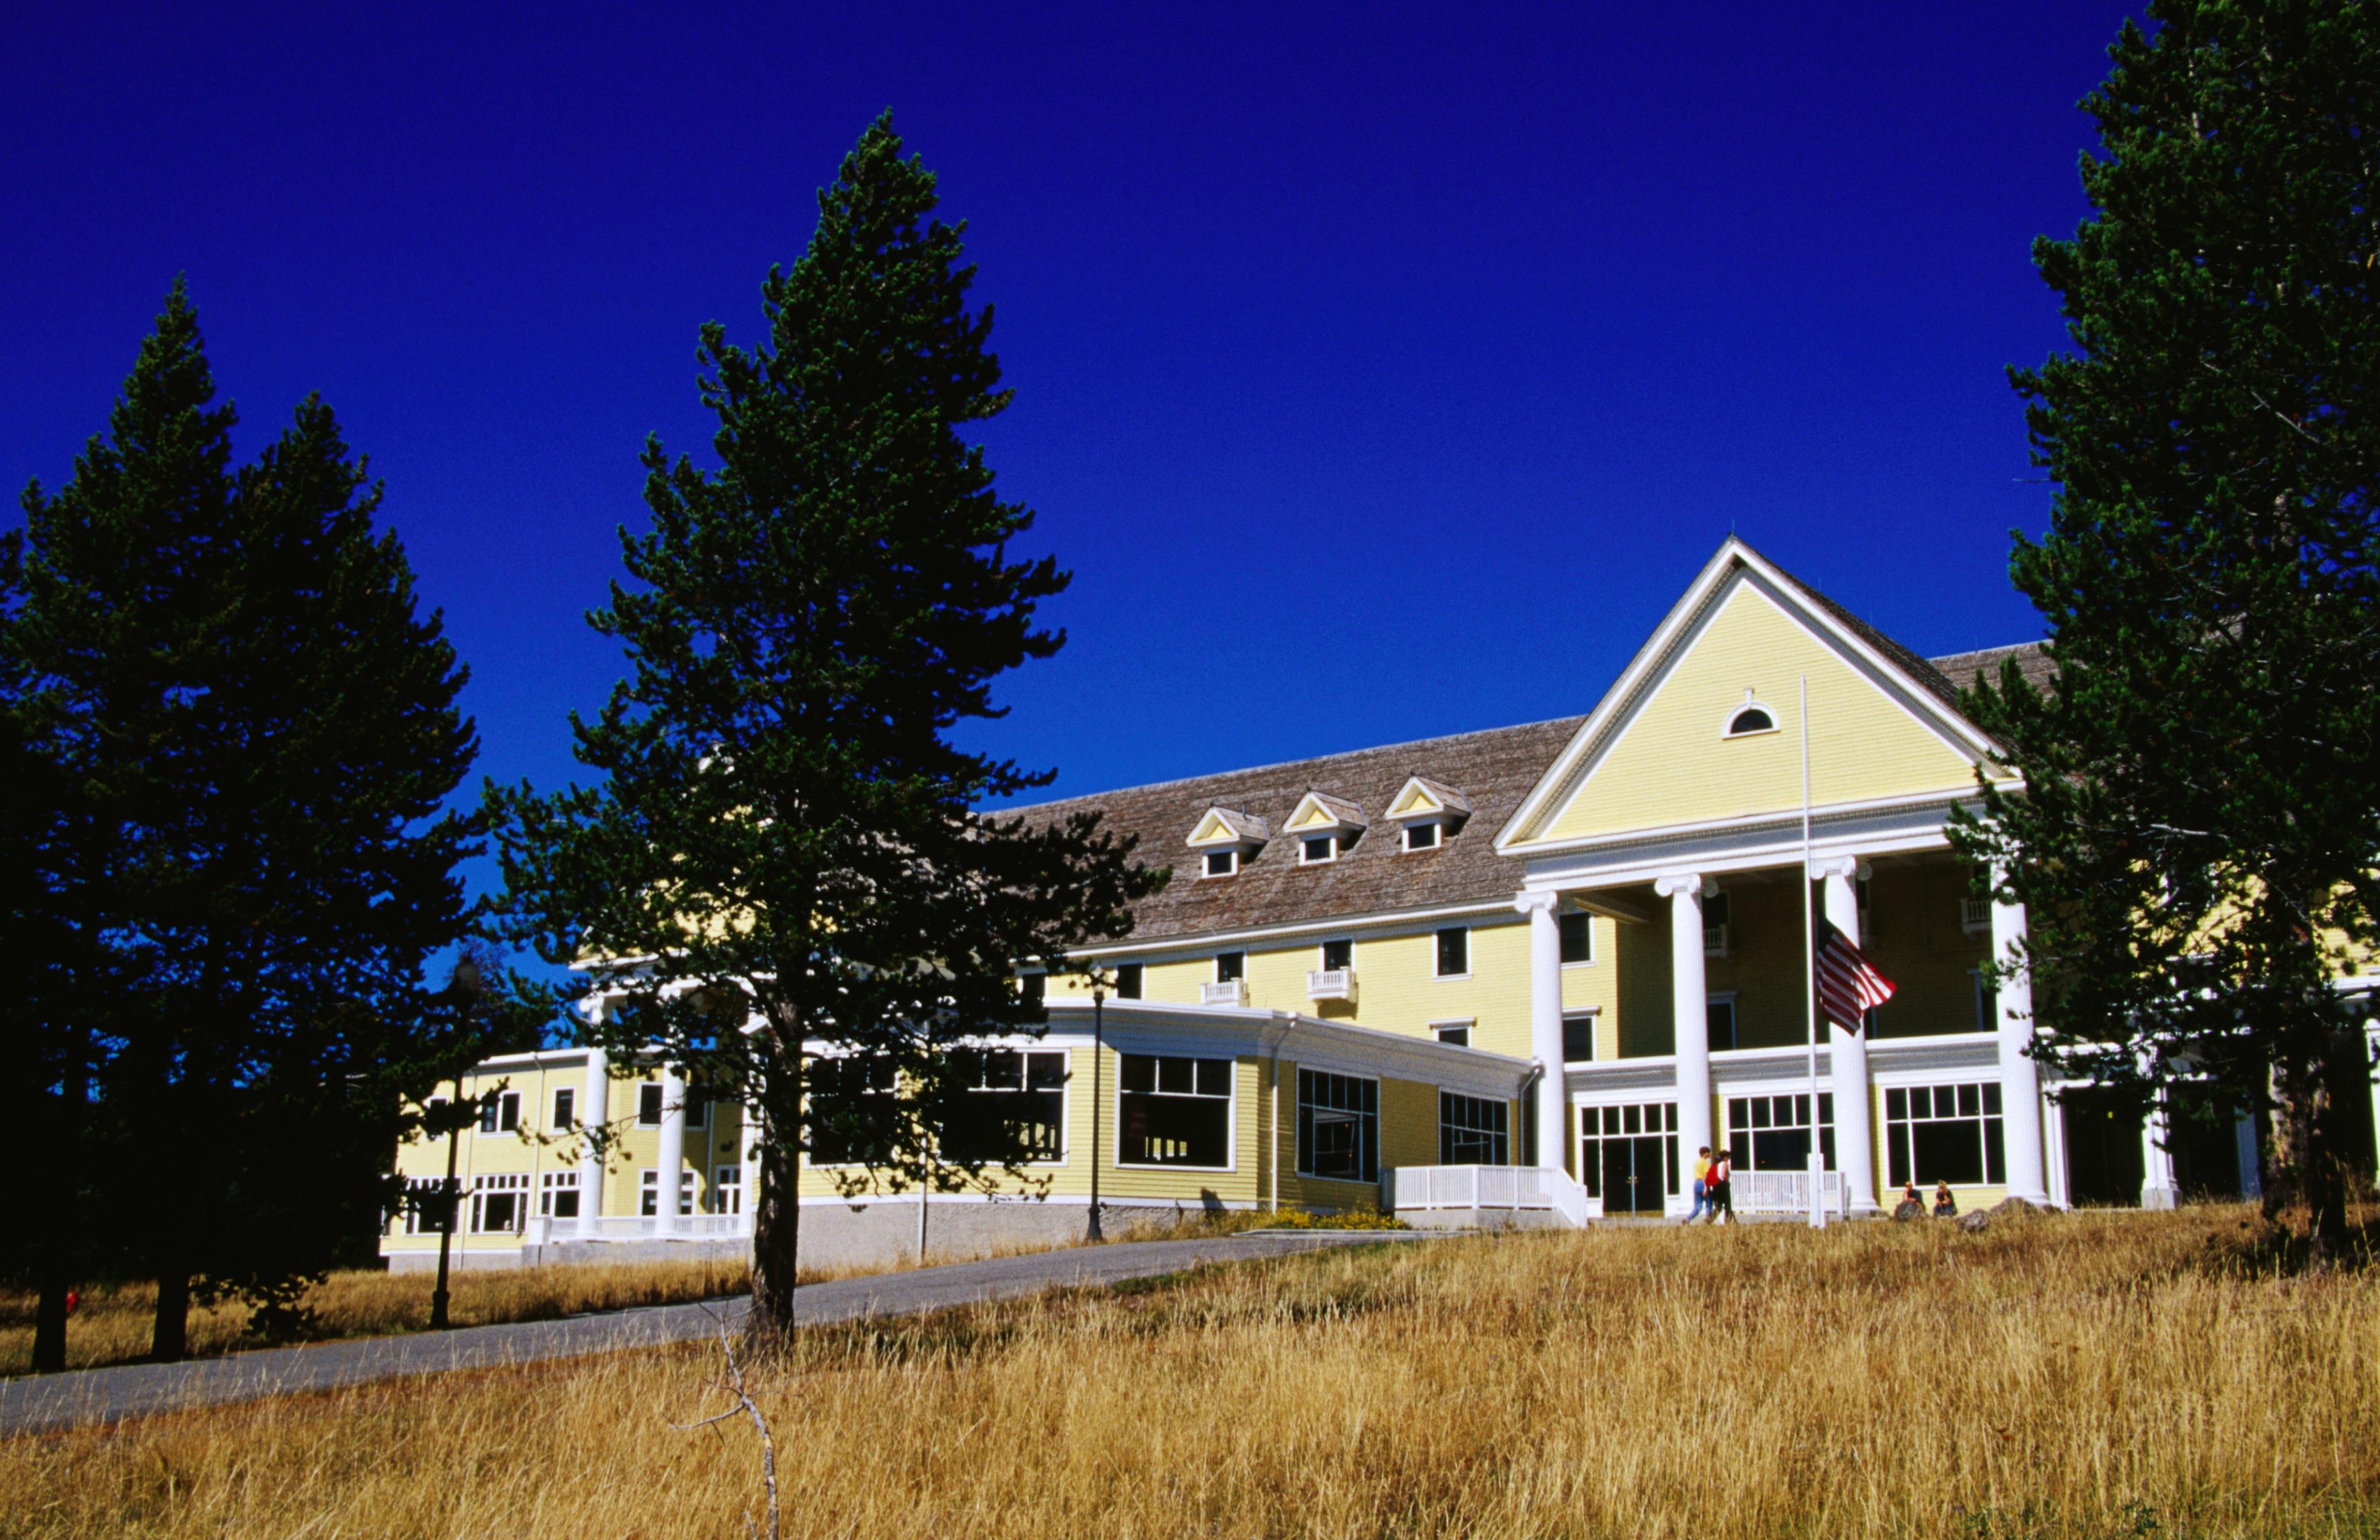 Lake Yellowstone Hotel Dining Room National